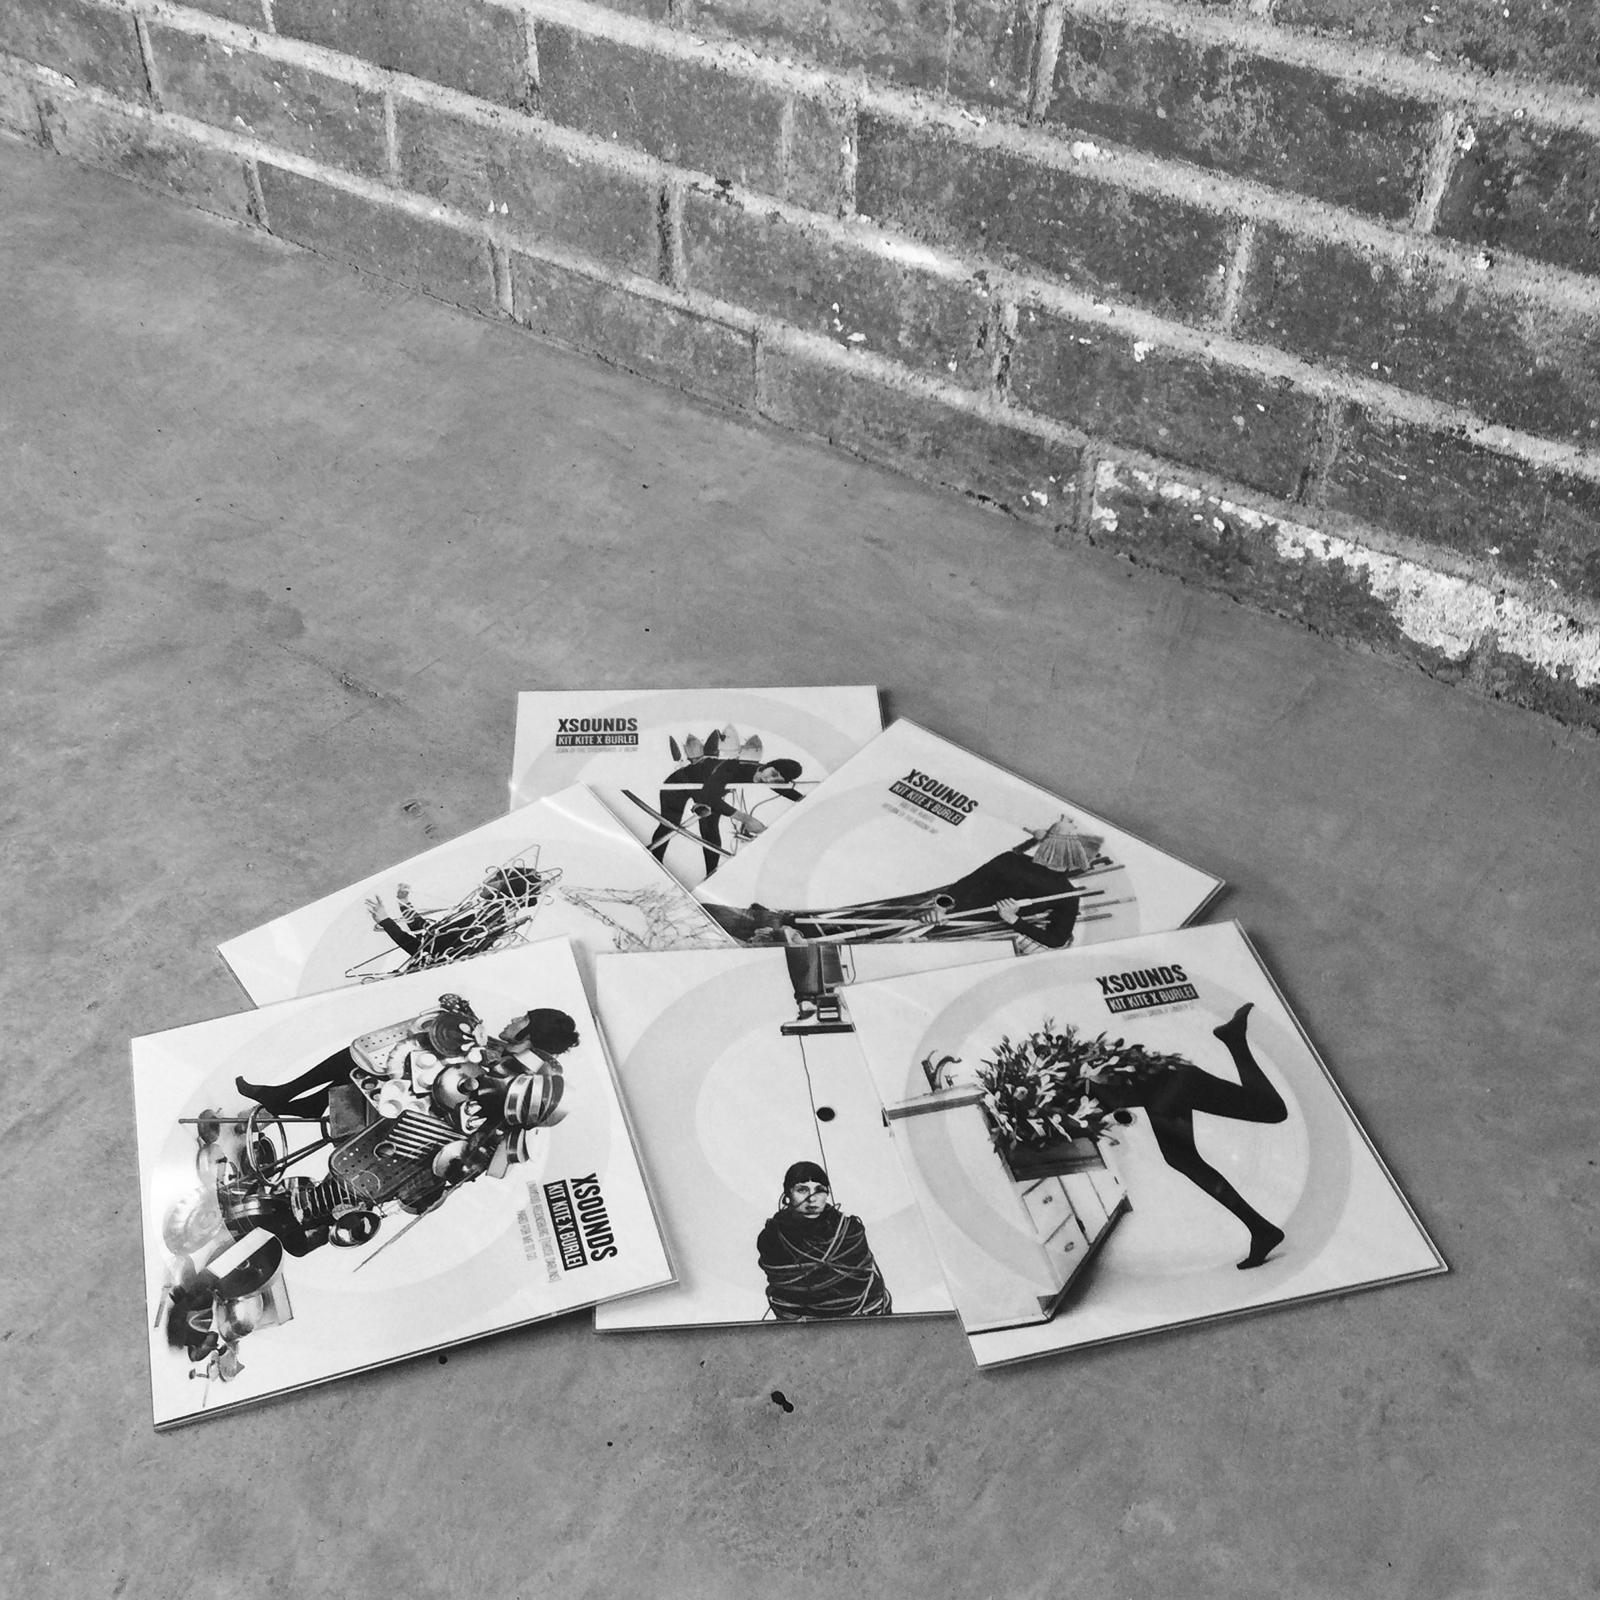 XSOUNDS-RECORDS-BW.jpg